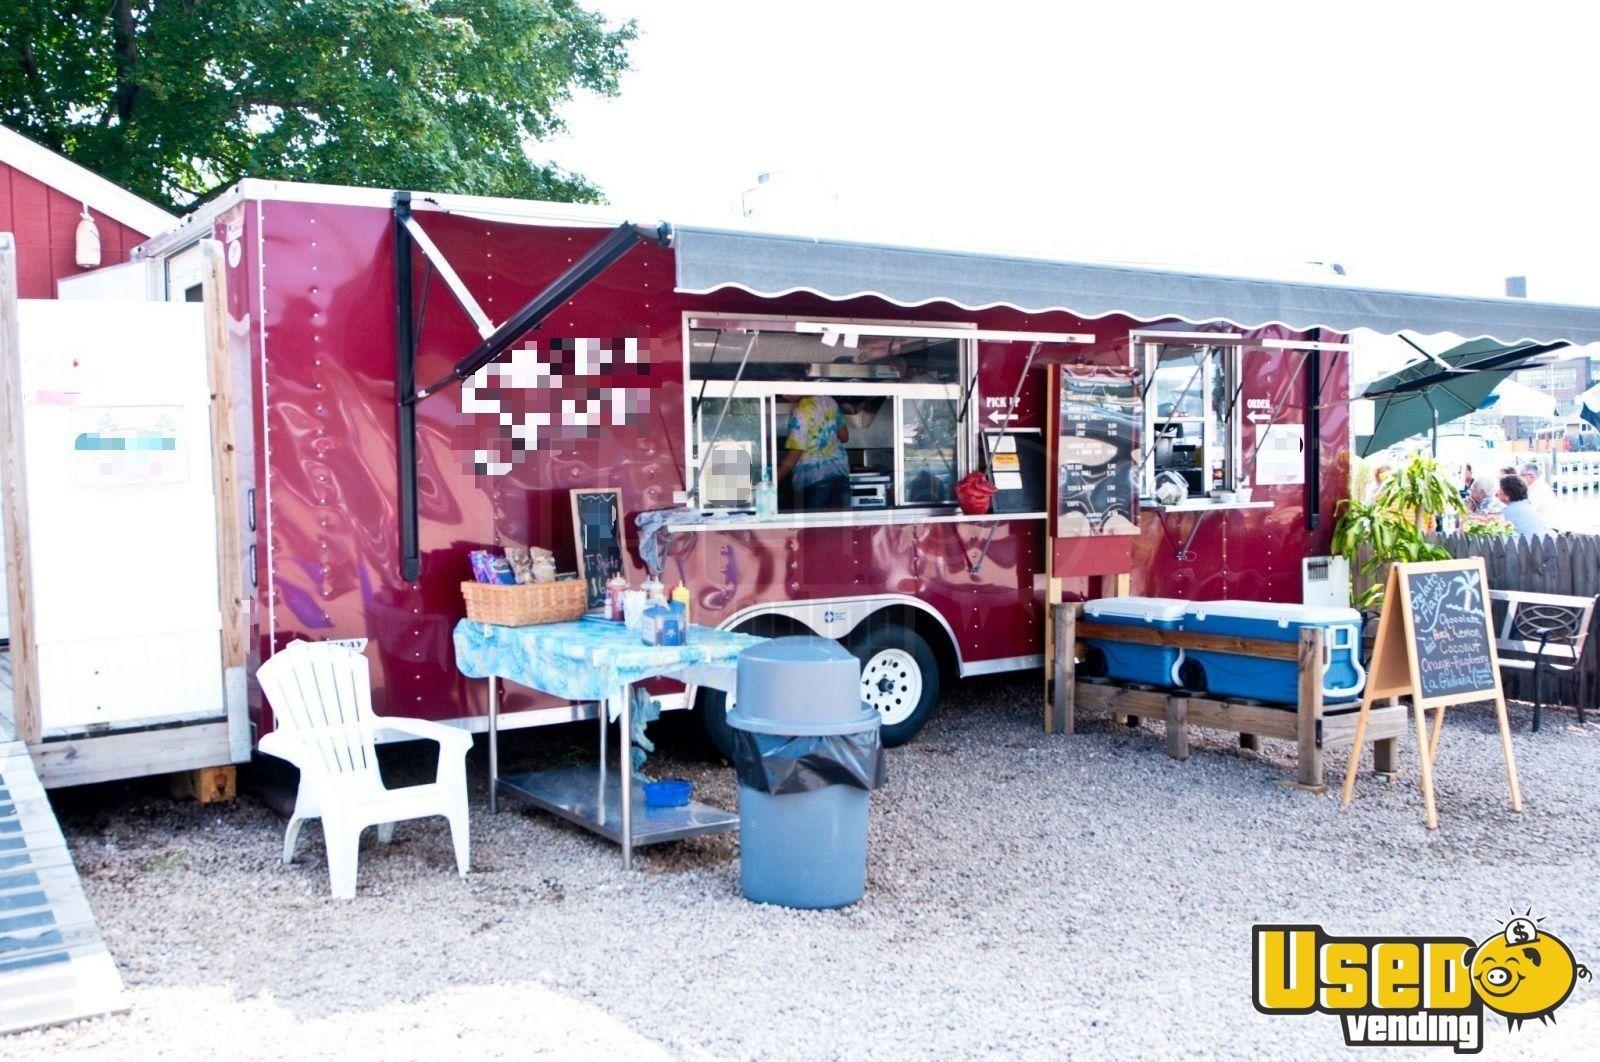 food concession trailers for sale craigslist